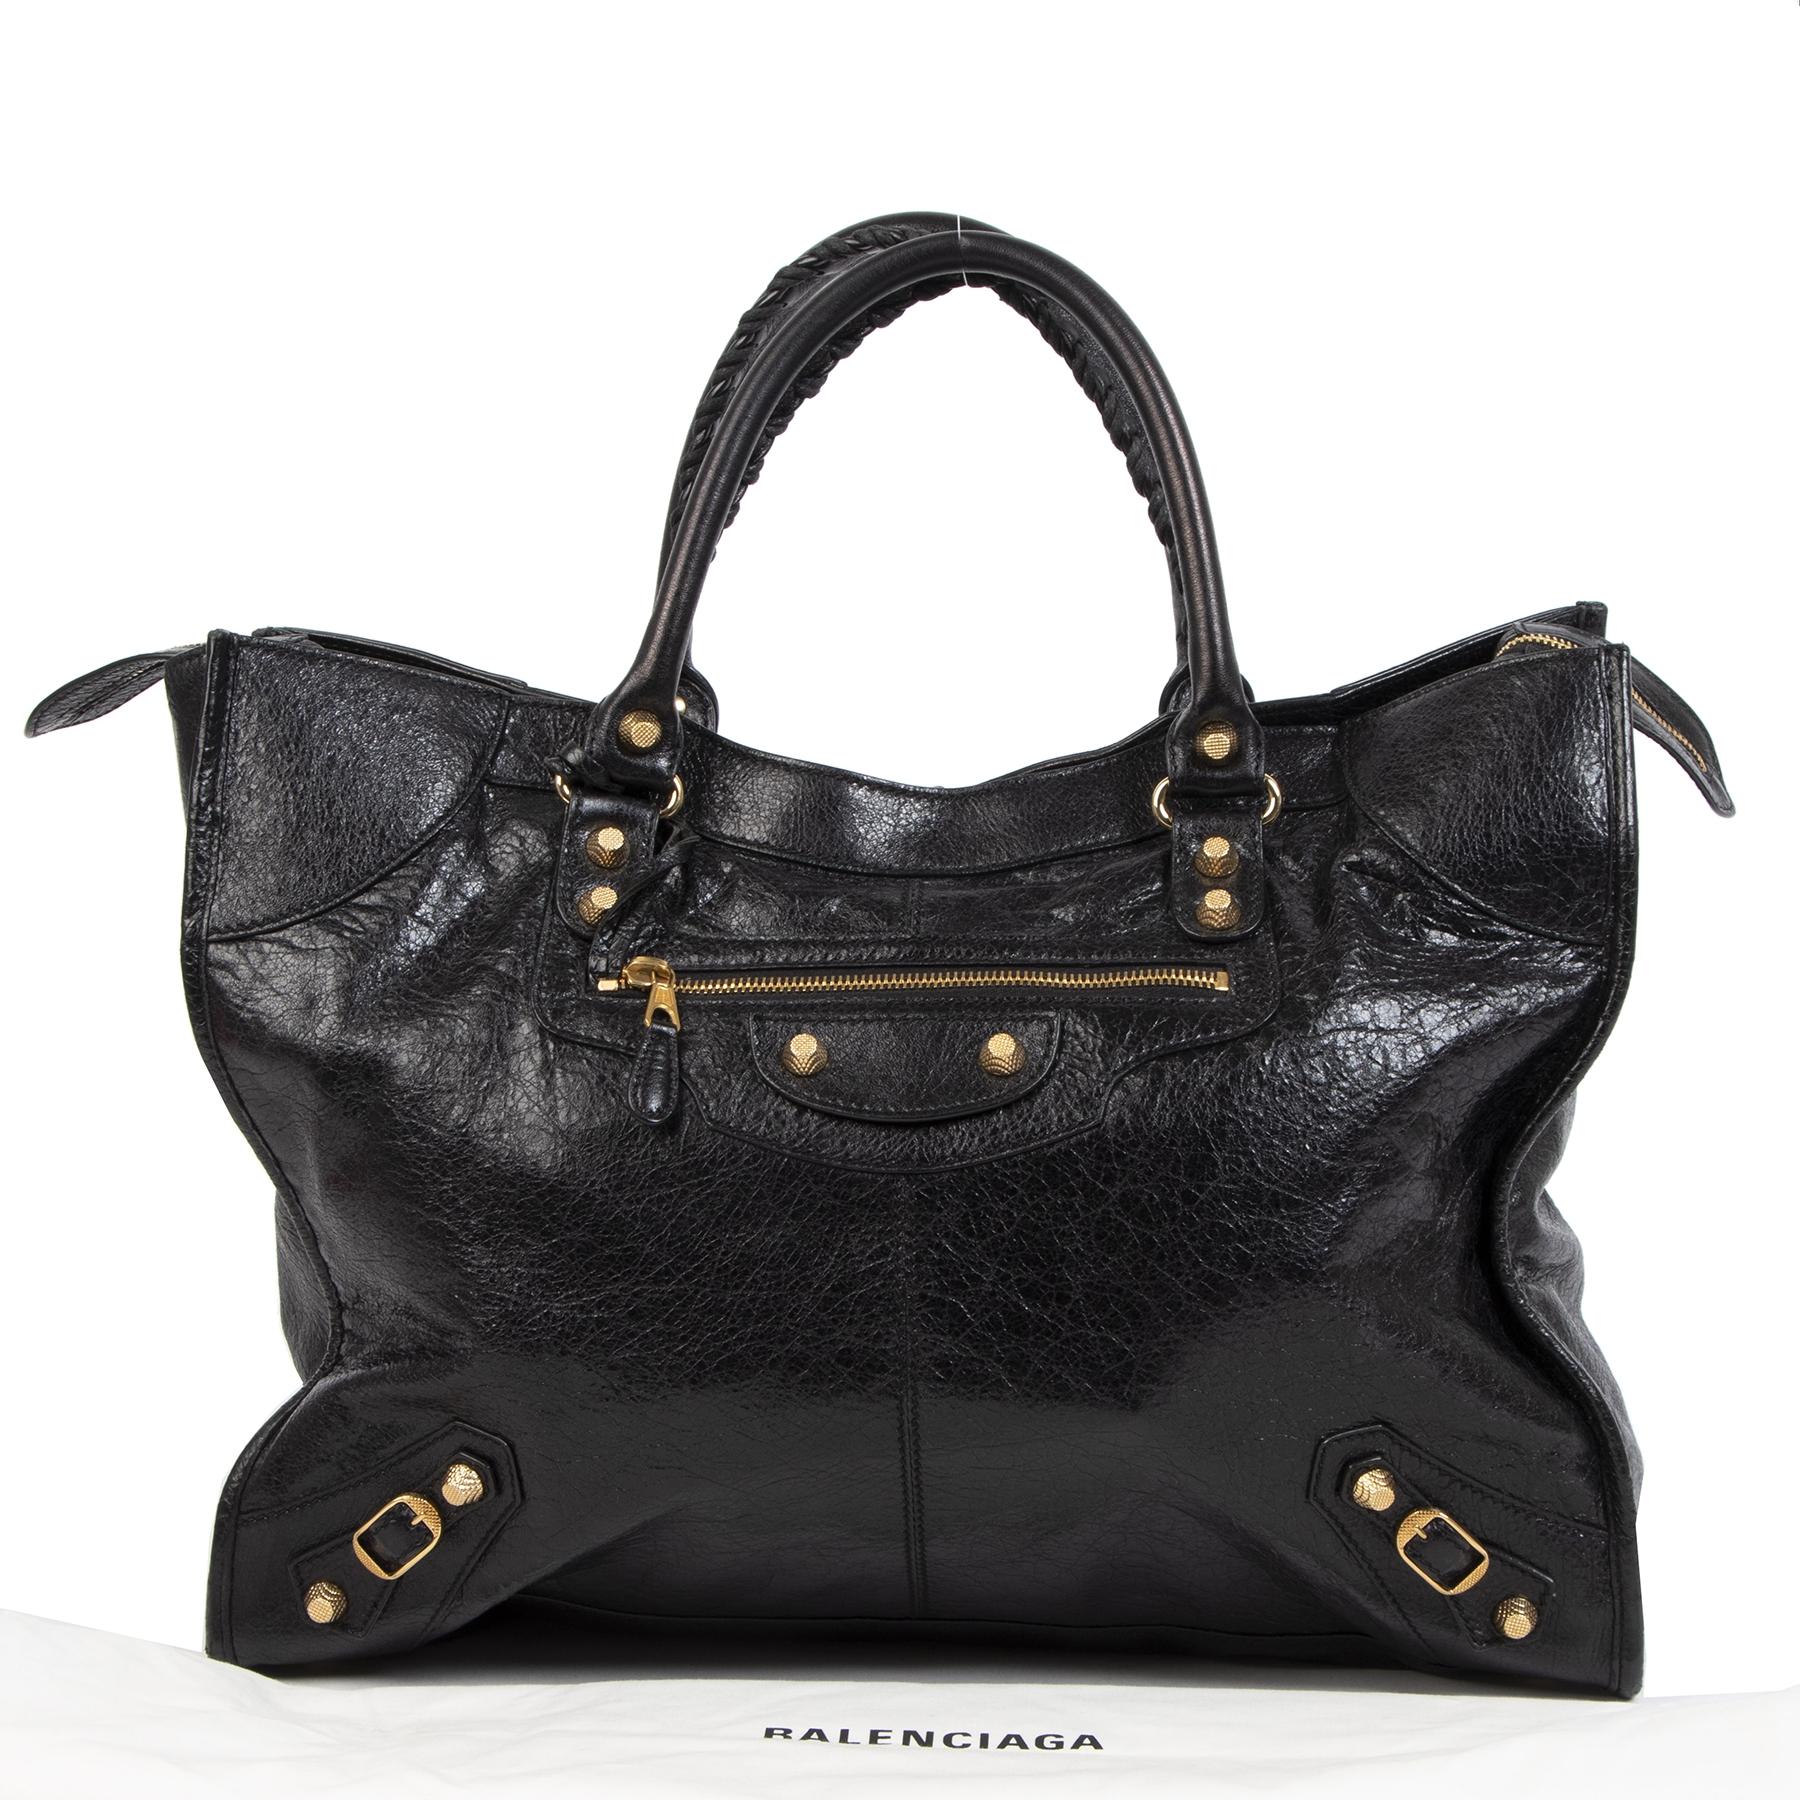 Balenciaga Monday Black Agneau Leather Shopper